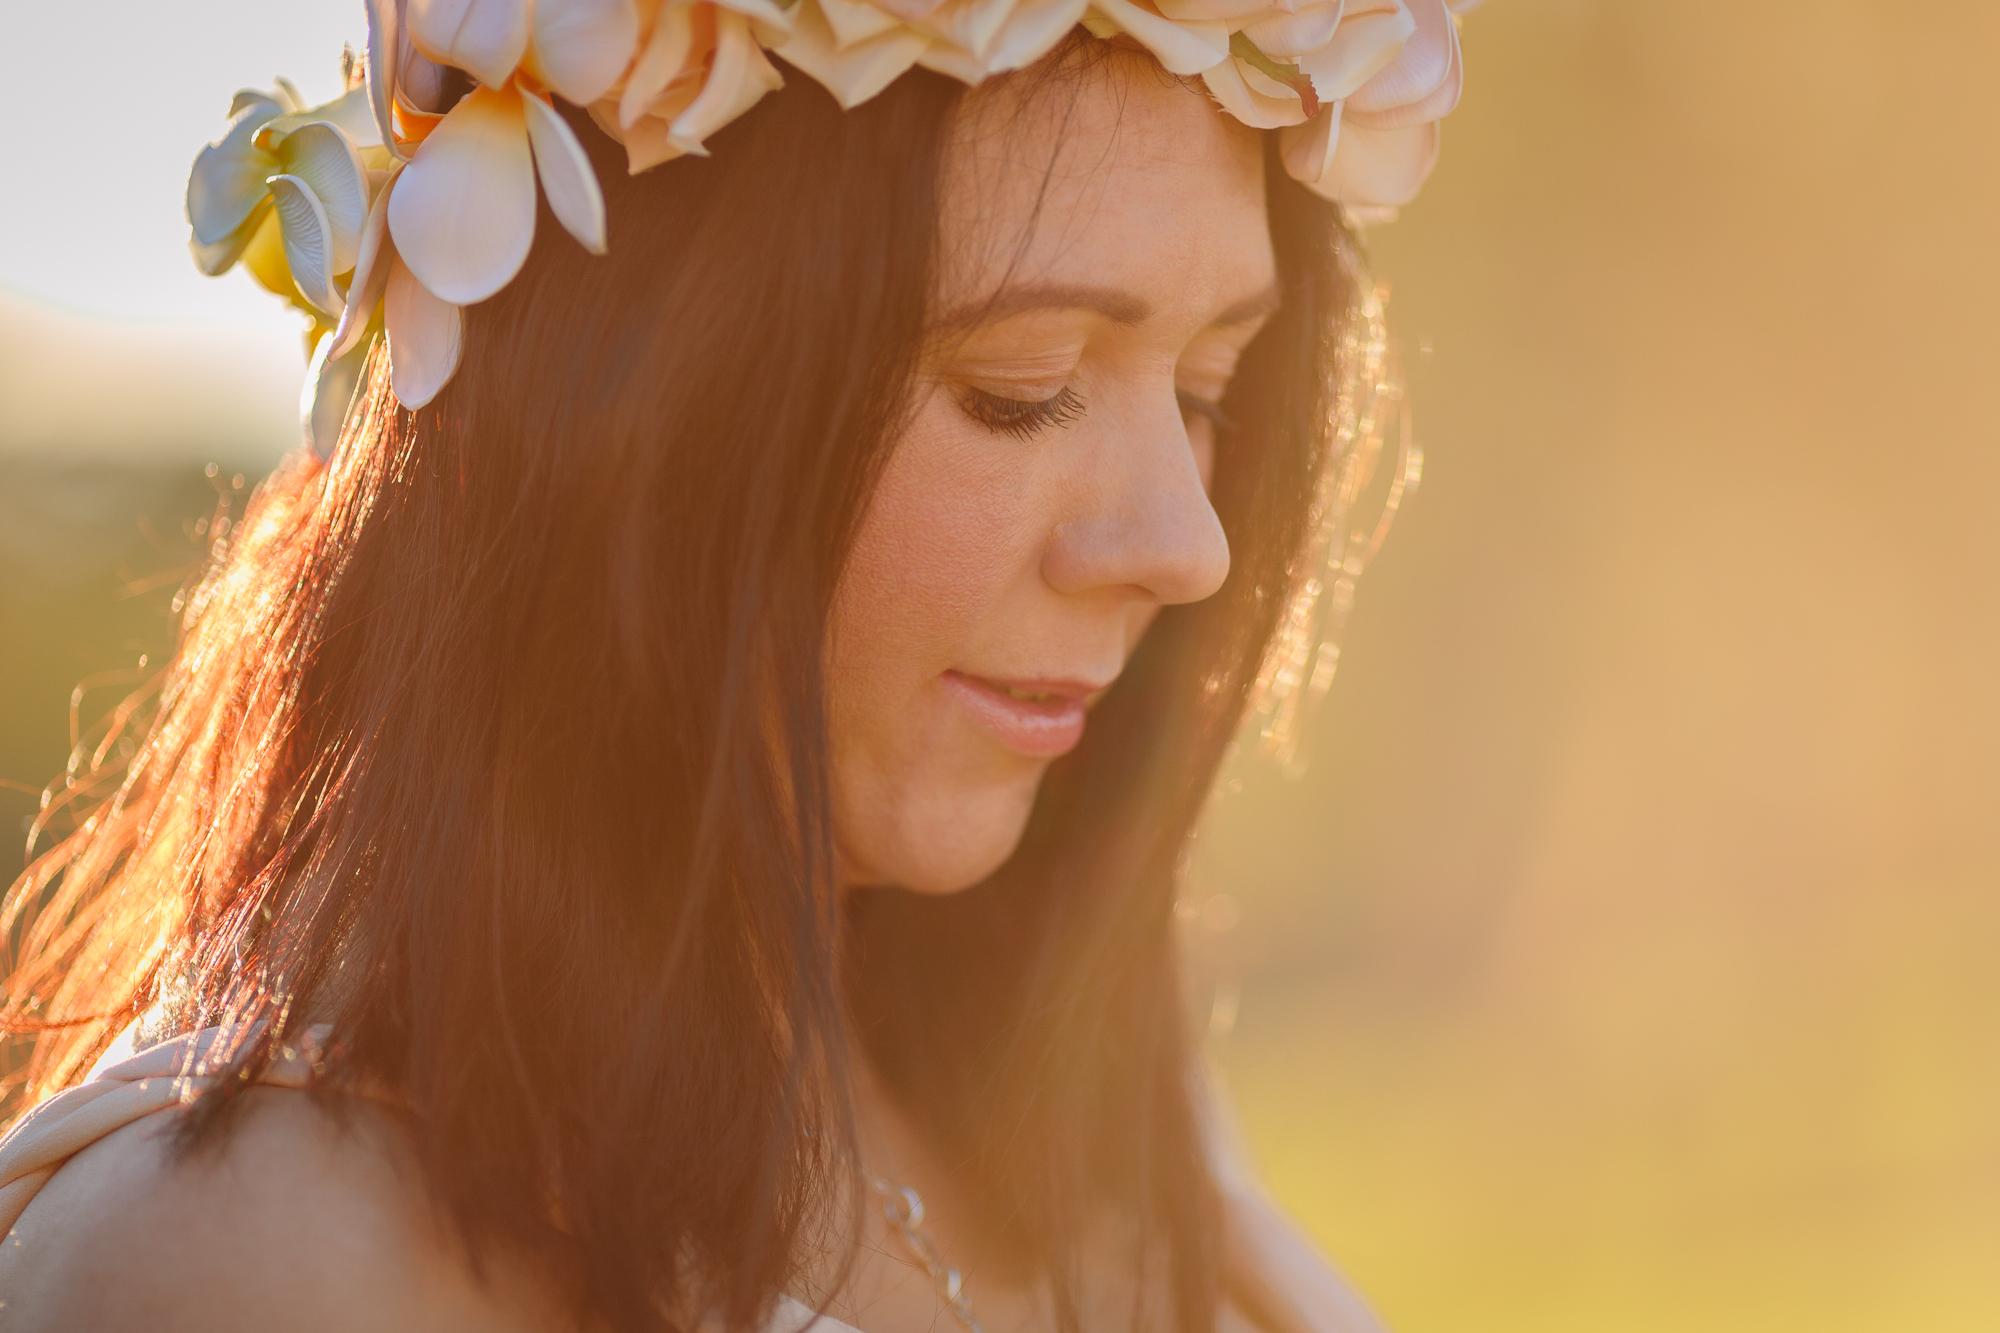 020_Maternity Lifetsyle_Shelley_Sunlight Photography.JPG